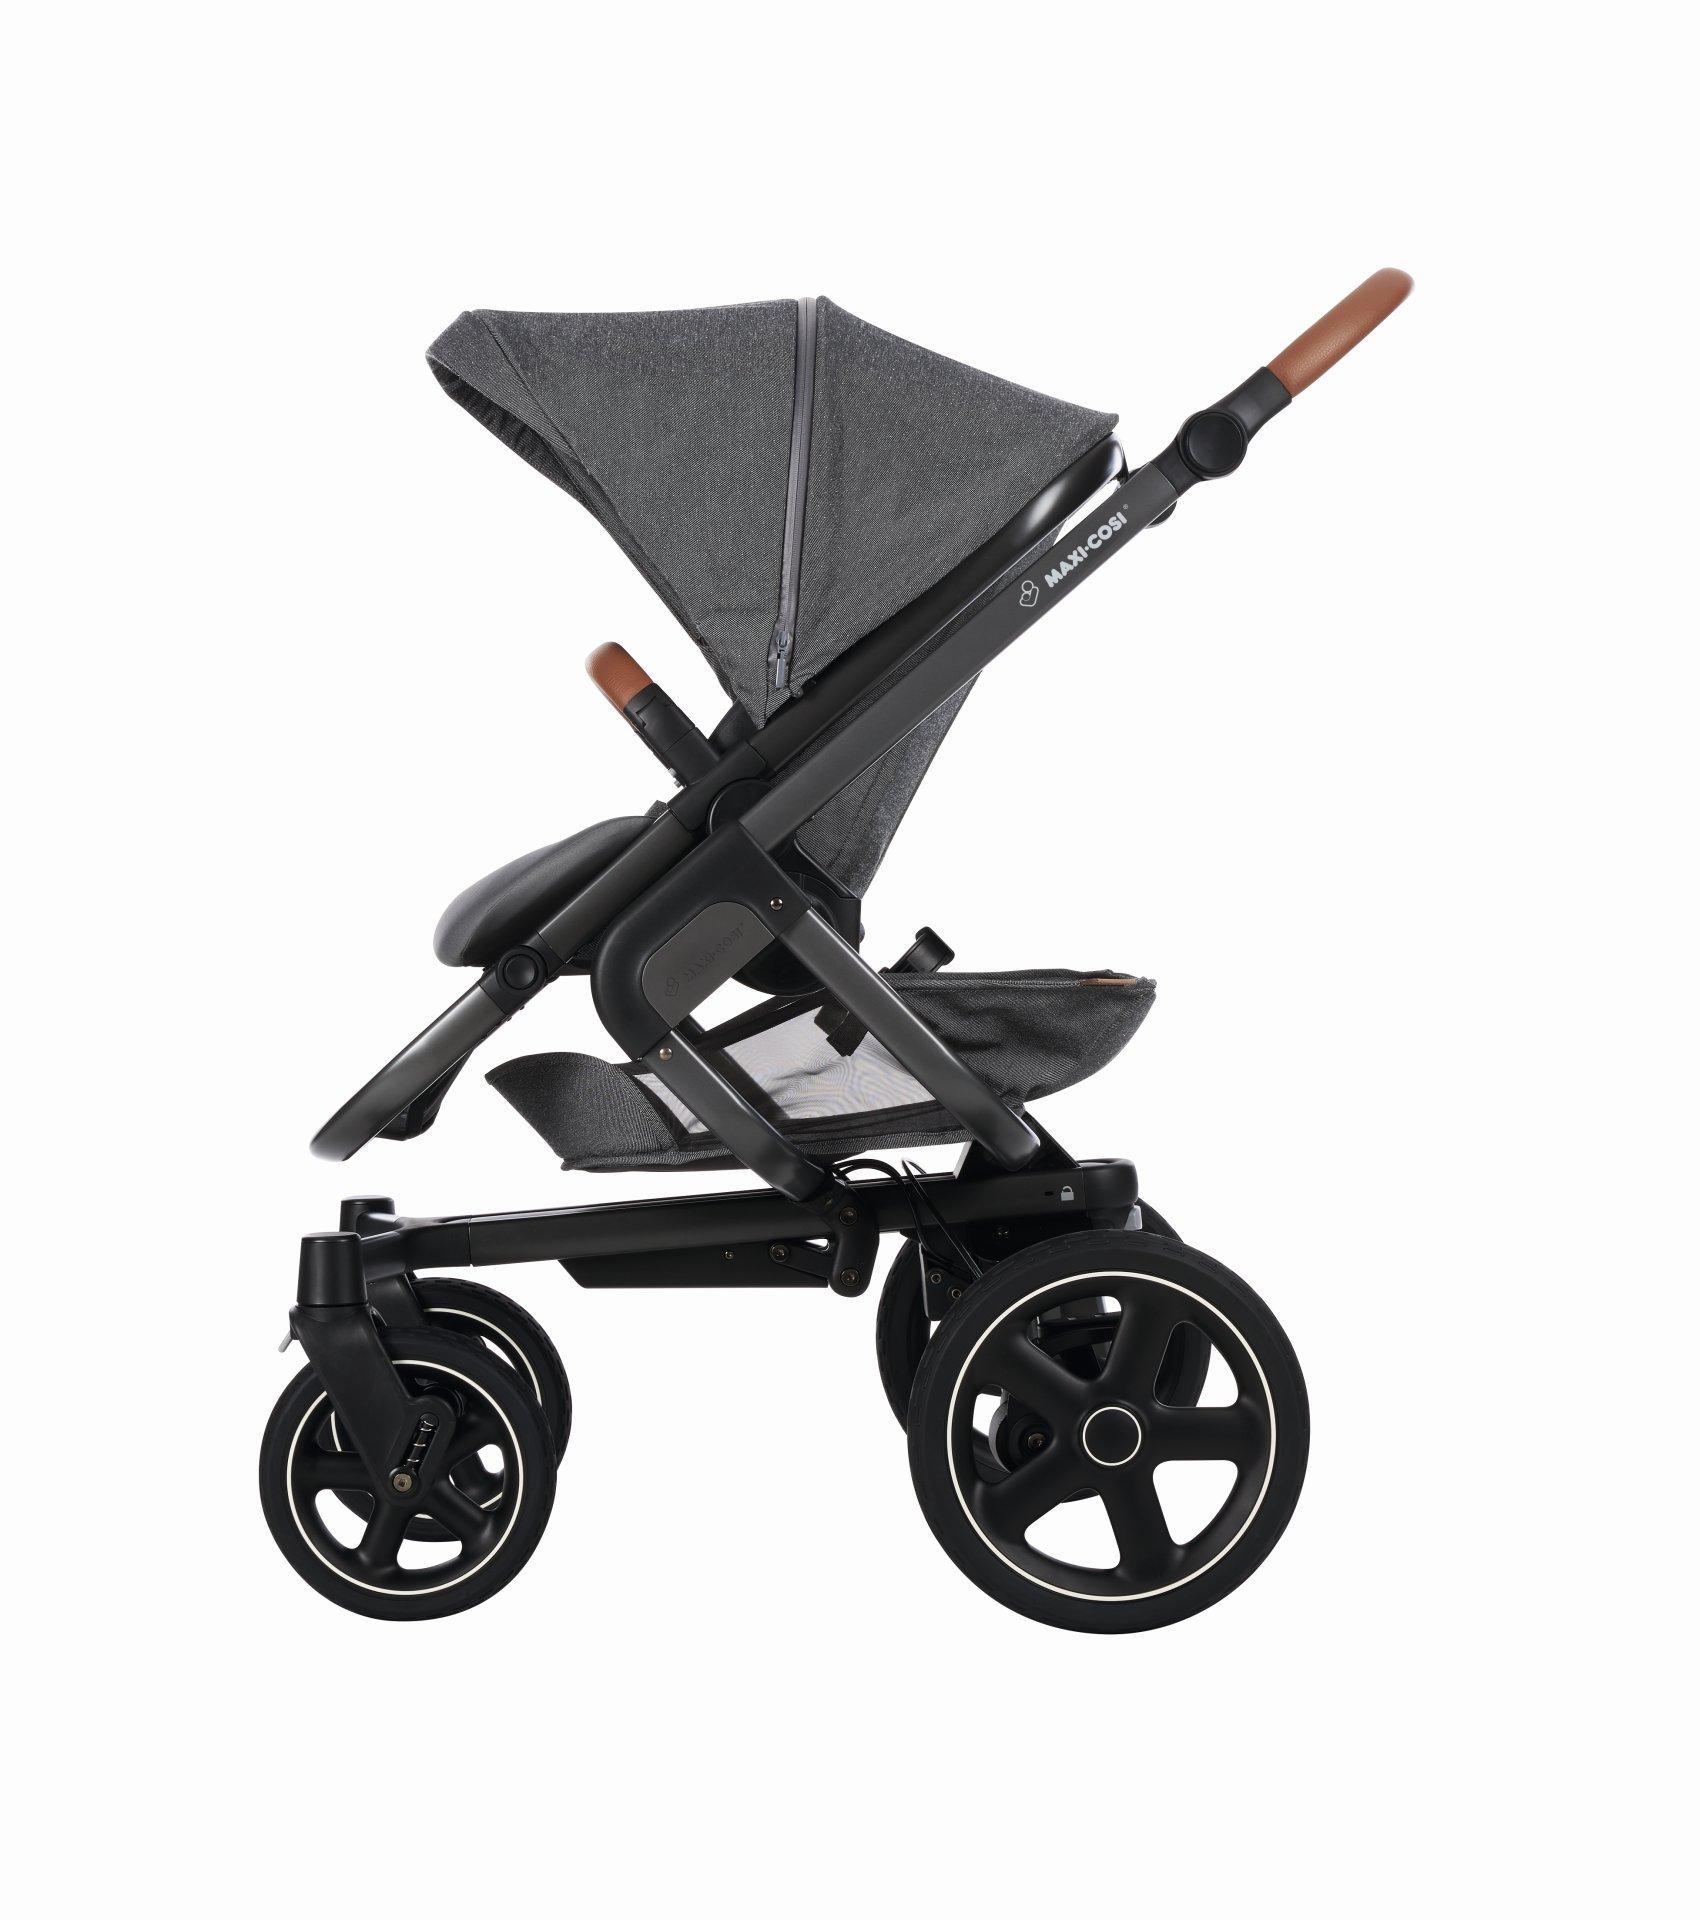 poussette maxi cosi nova 4 roues 2019 sparkling grey acheter sur kidsroom poussettes